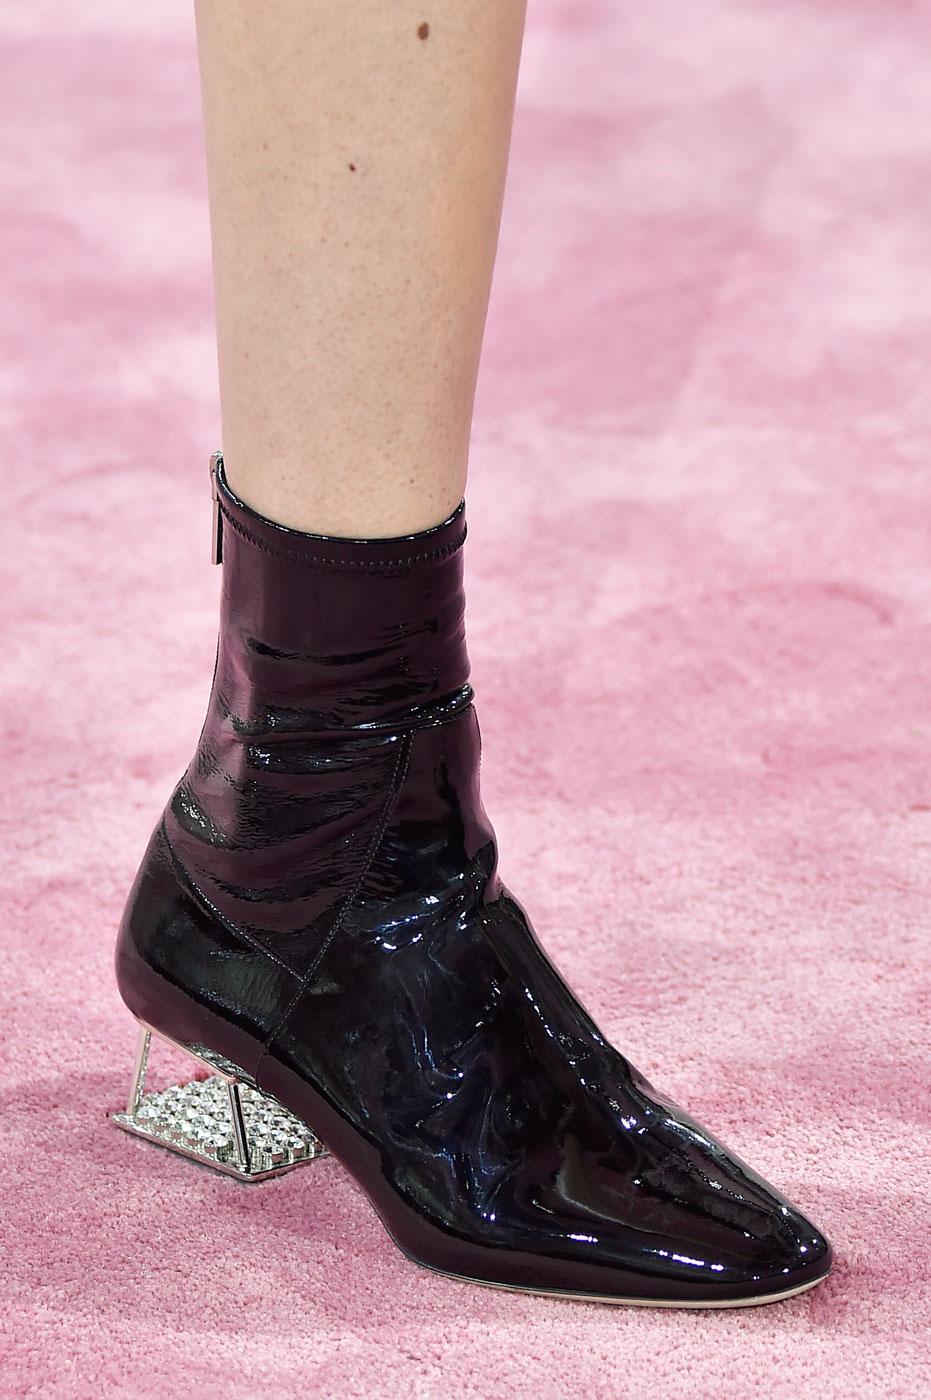 Christian-Dior-fashion-runway-show-close-ups-haute-couture-paris-spring-summer-2015-the-impression-083